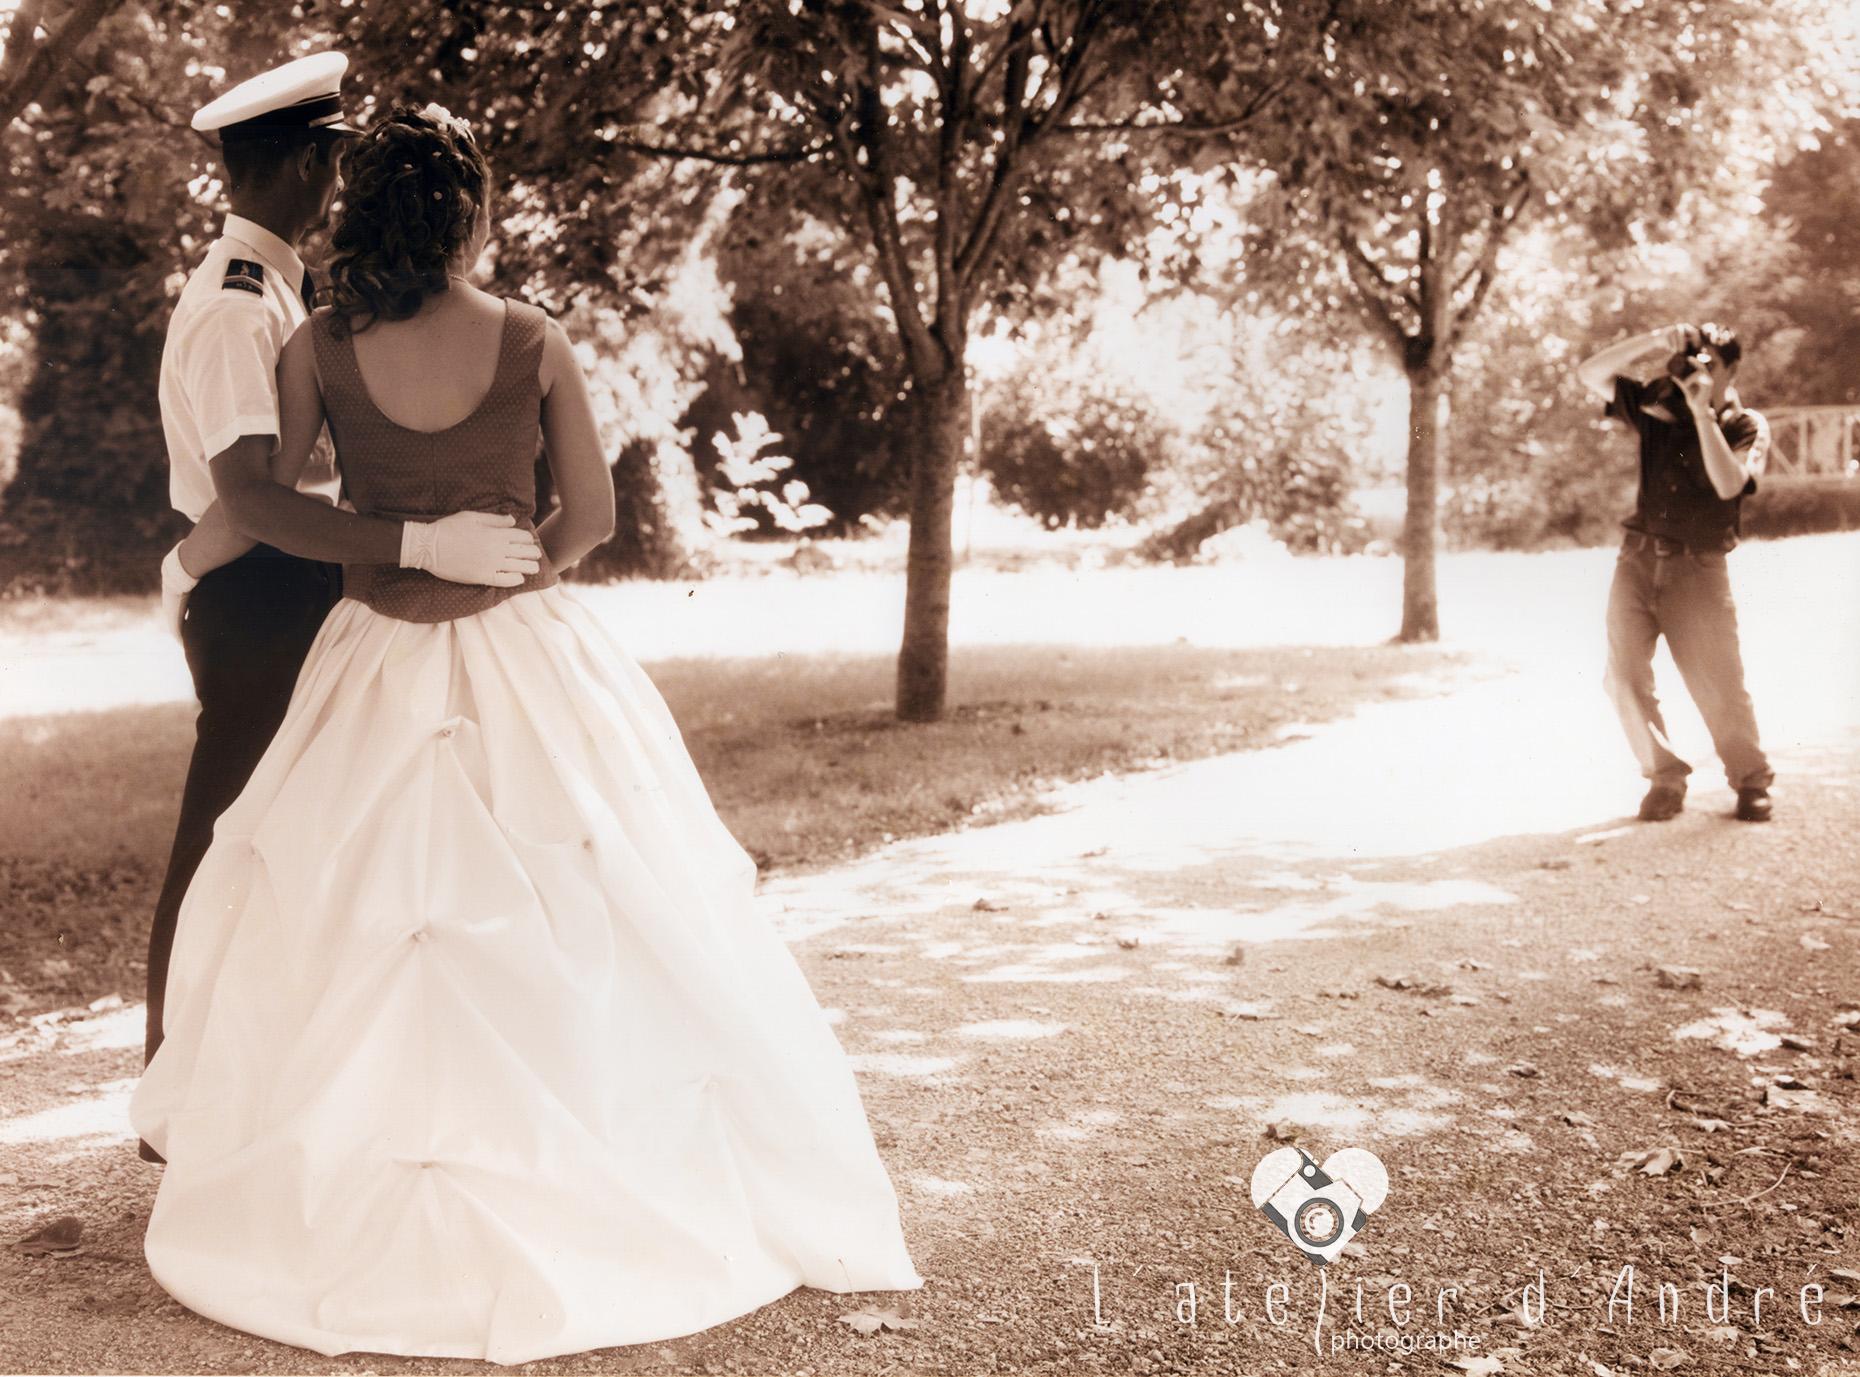 1 ere photo de mariage